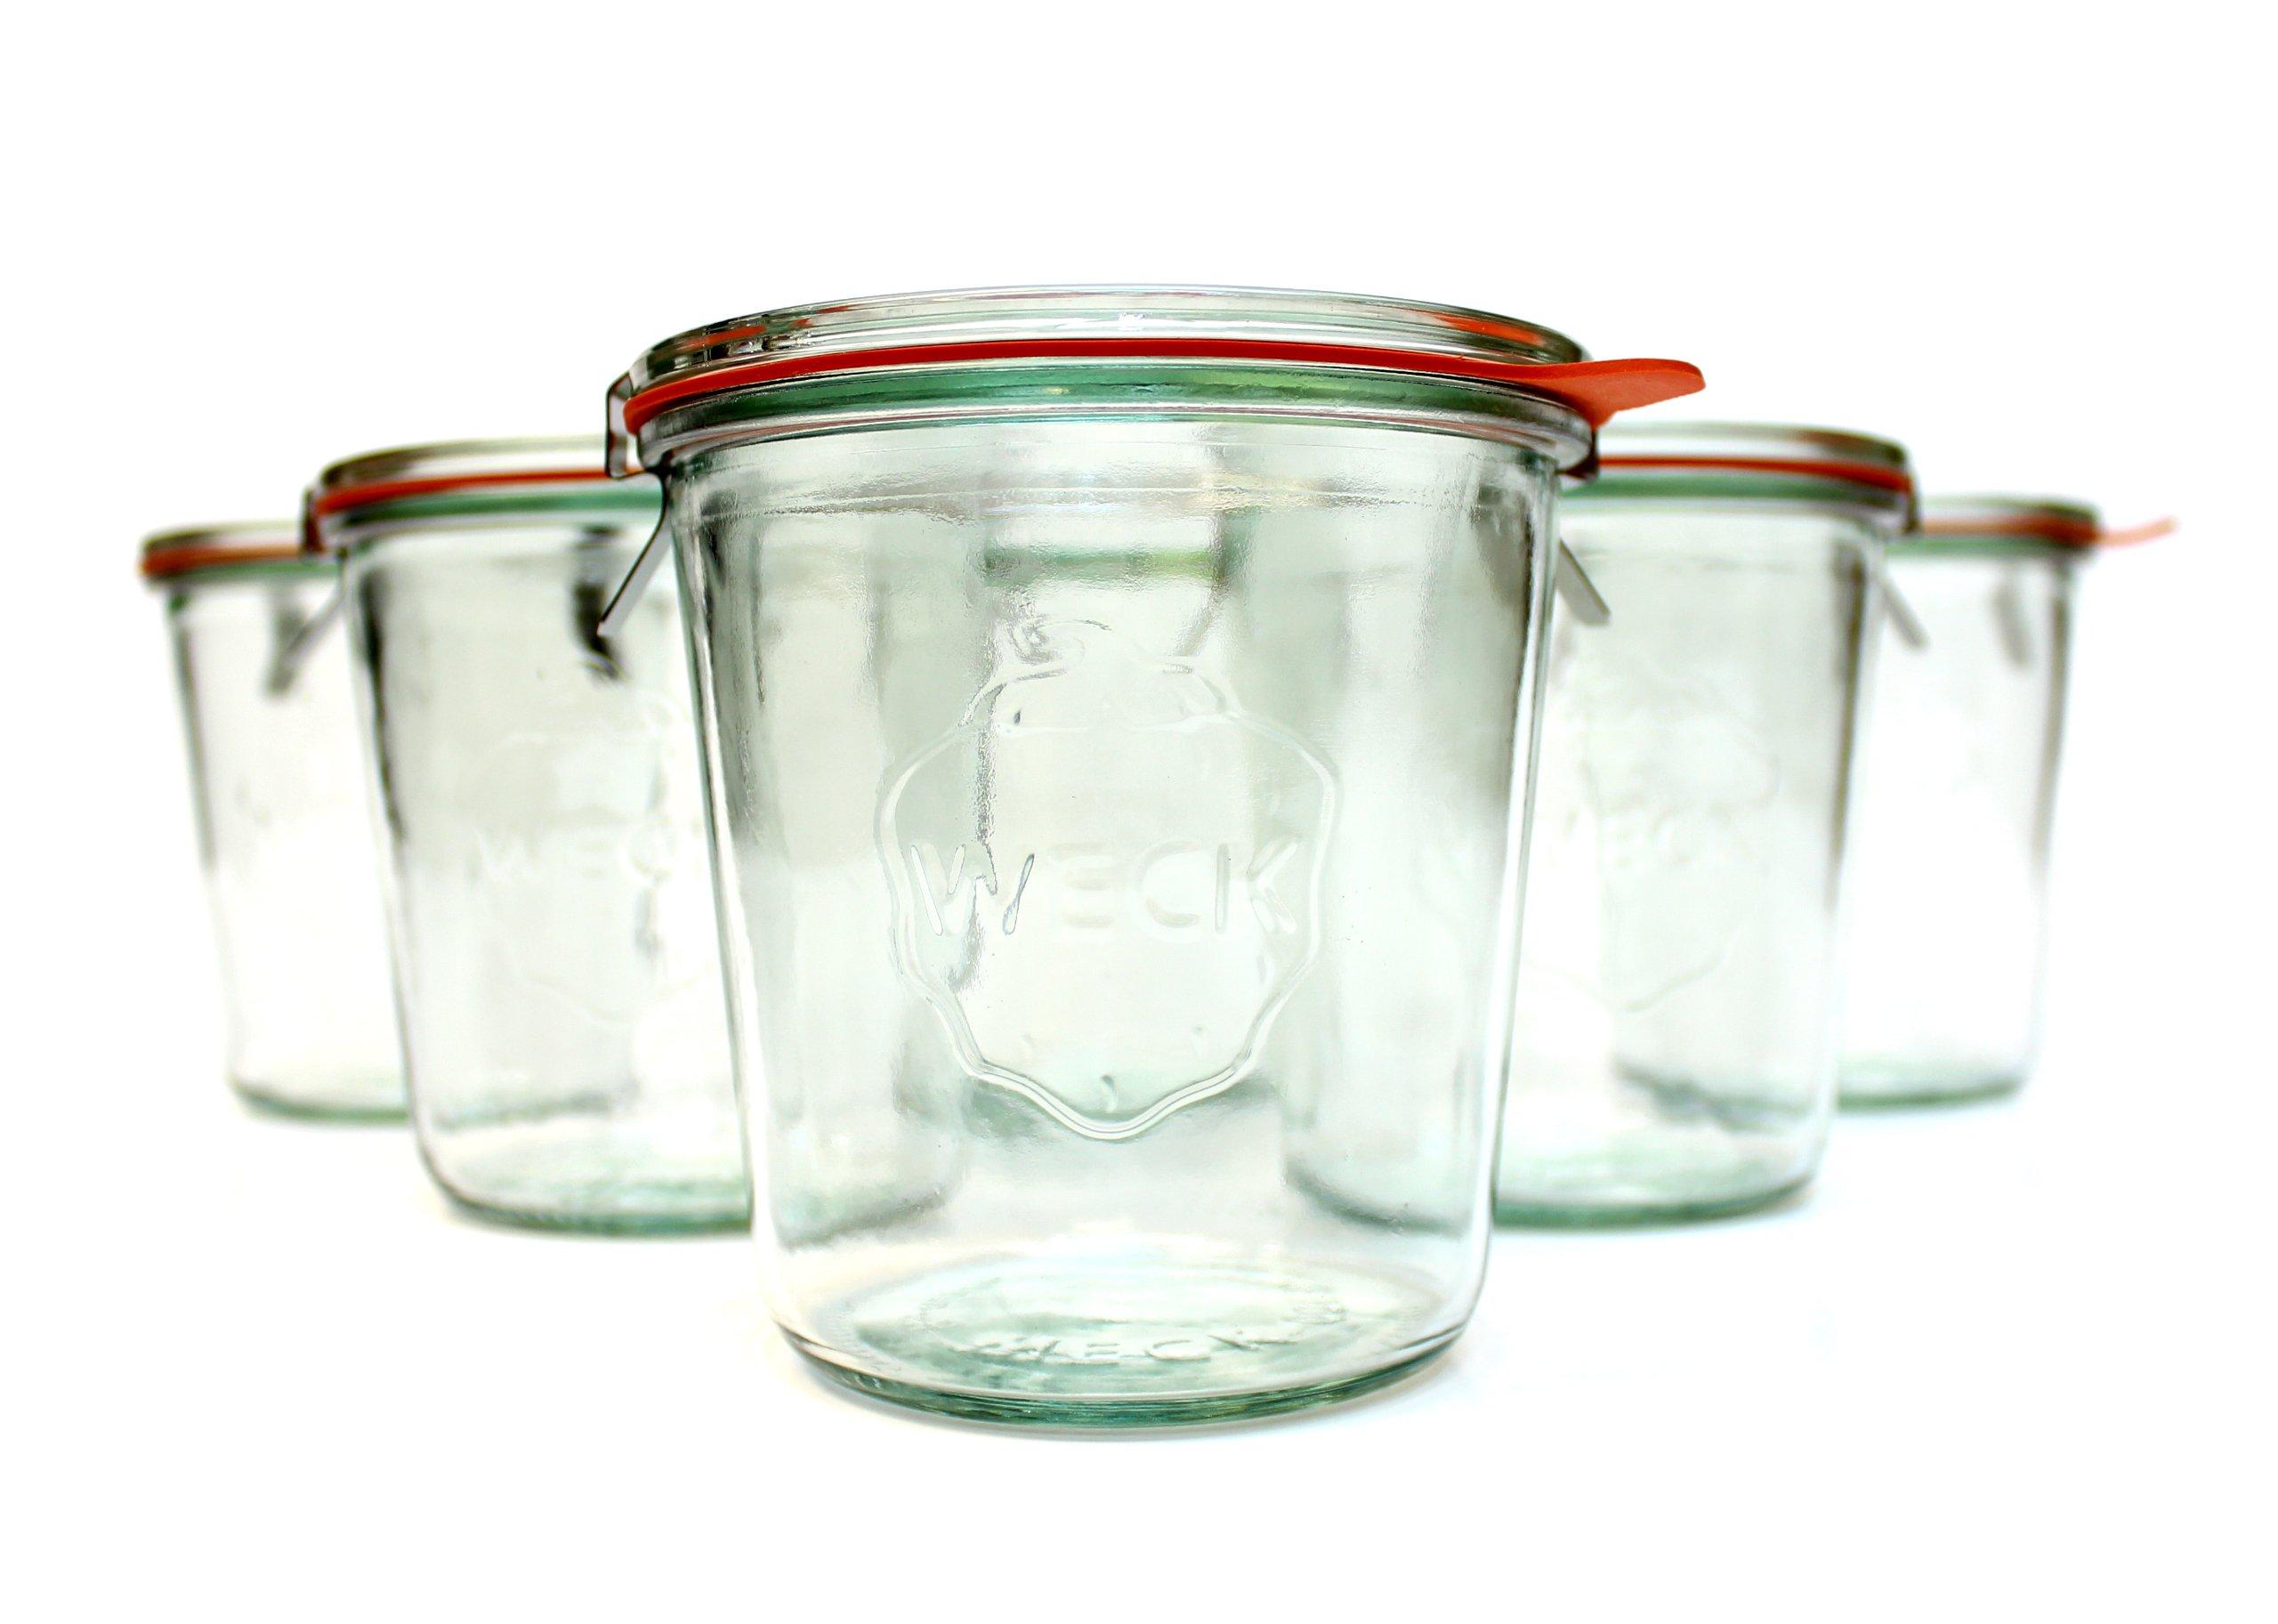 Weck 742 500mL (1/2L) Canning Jar; SET OF 6